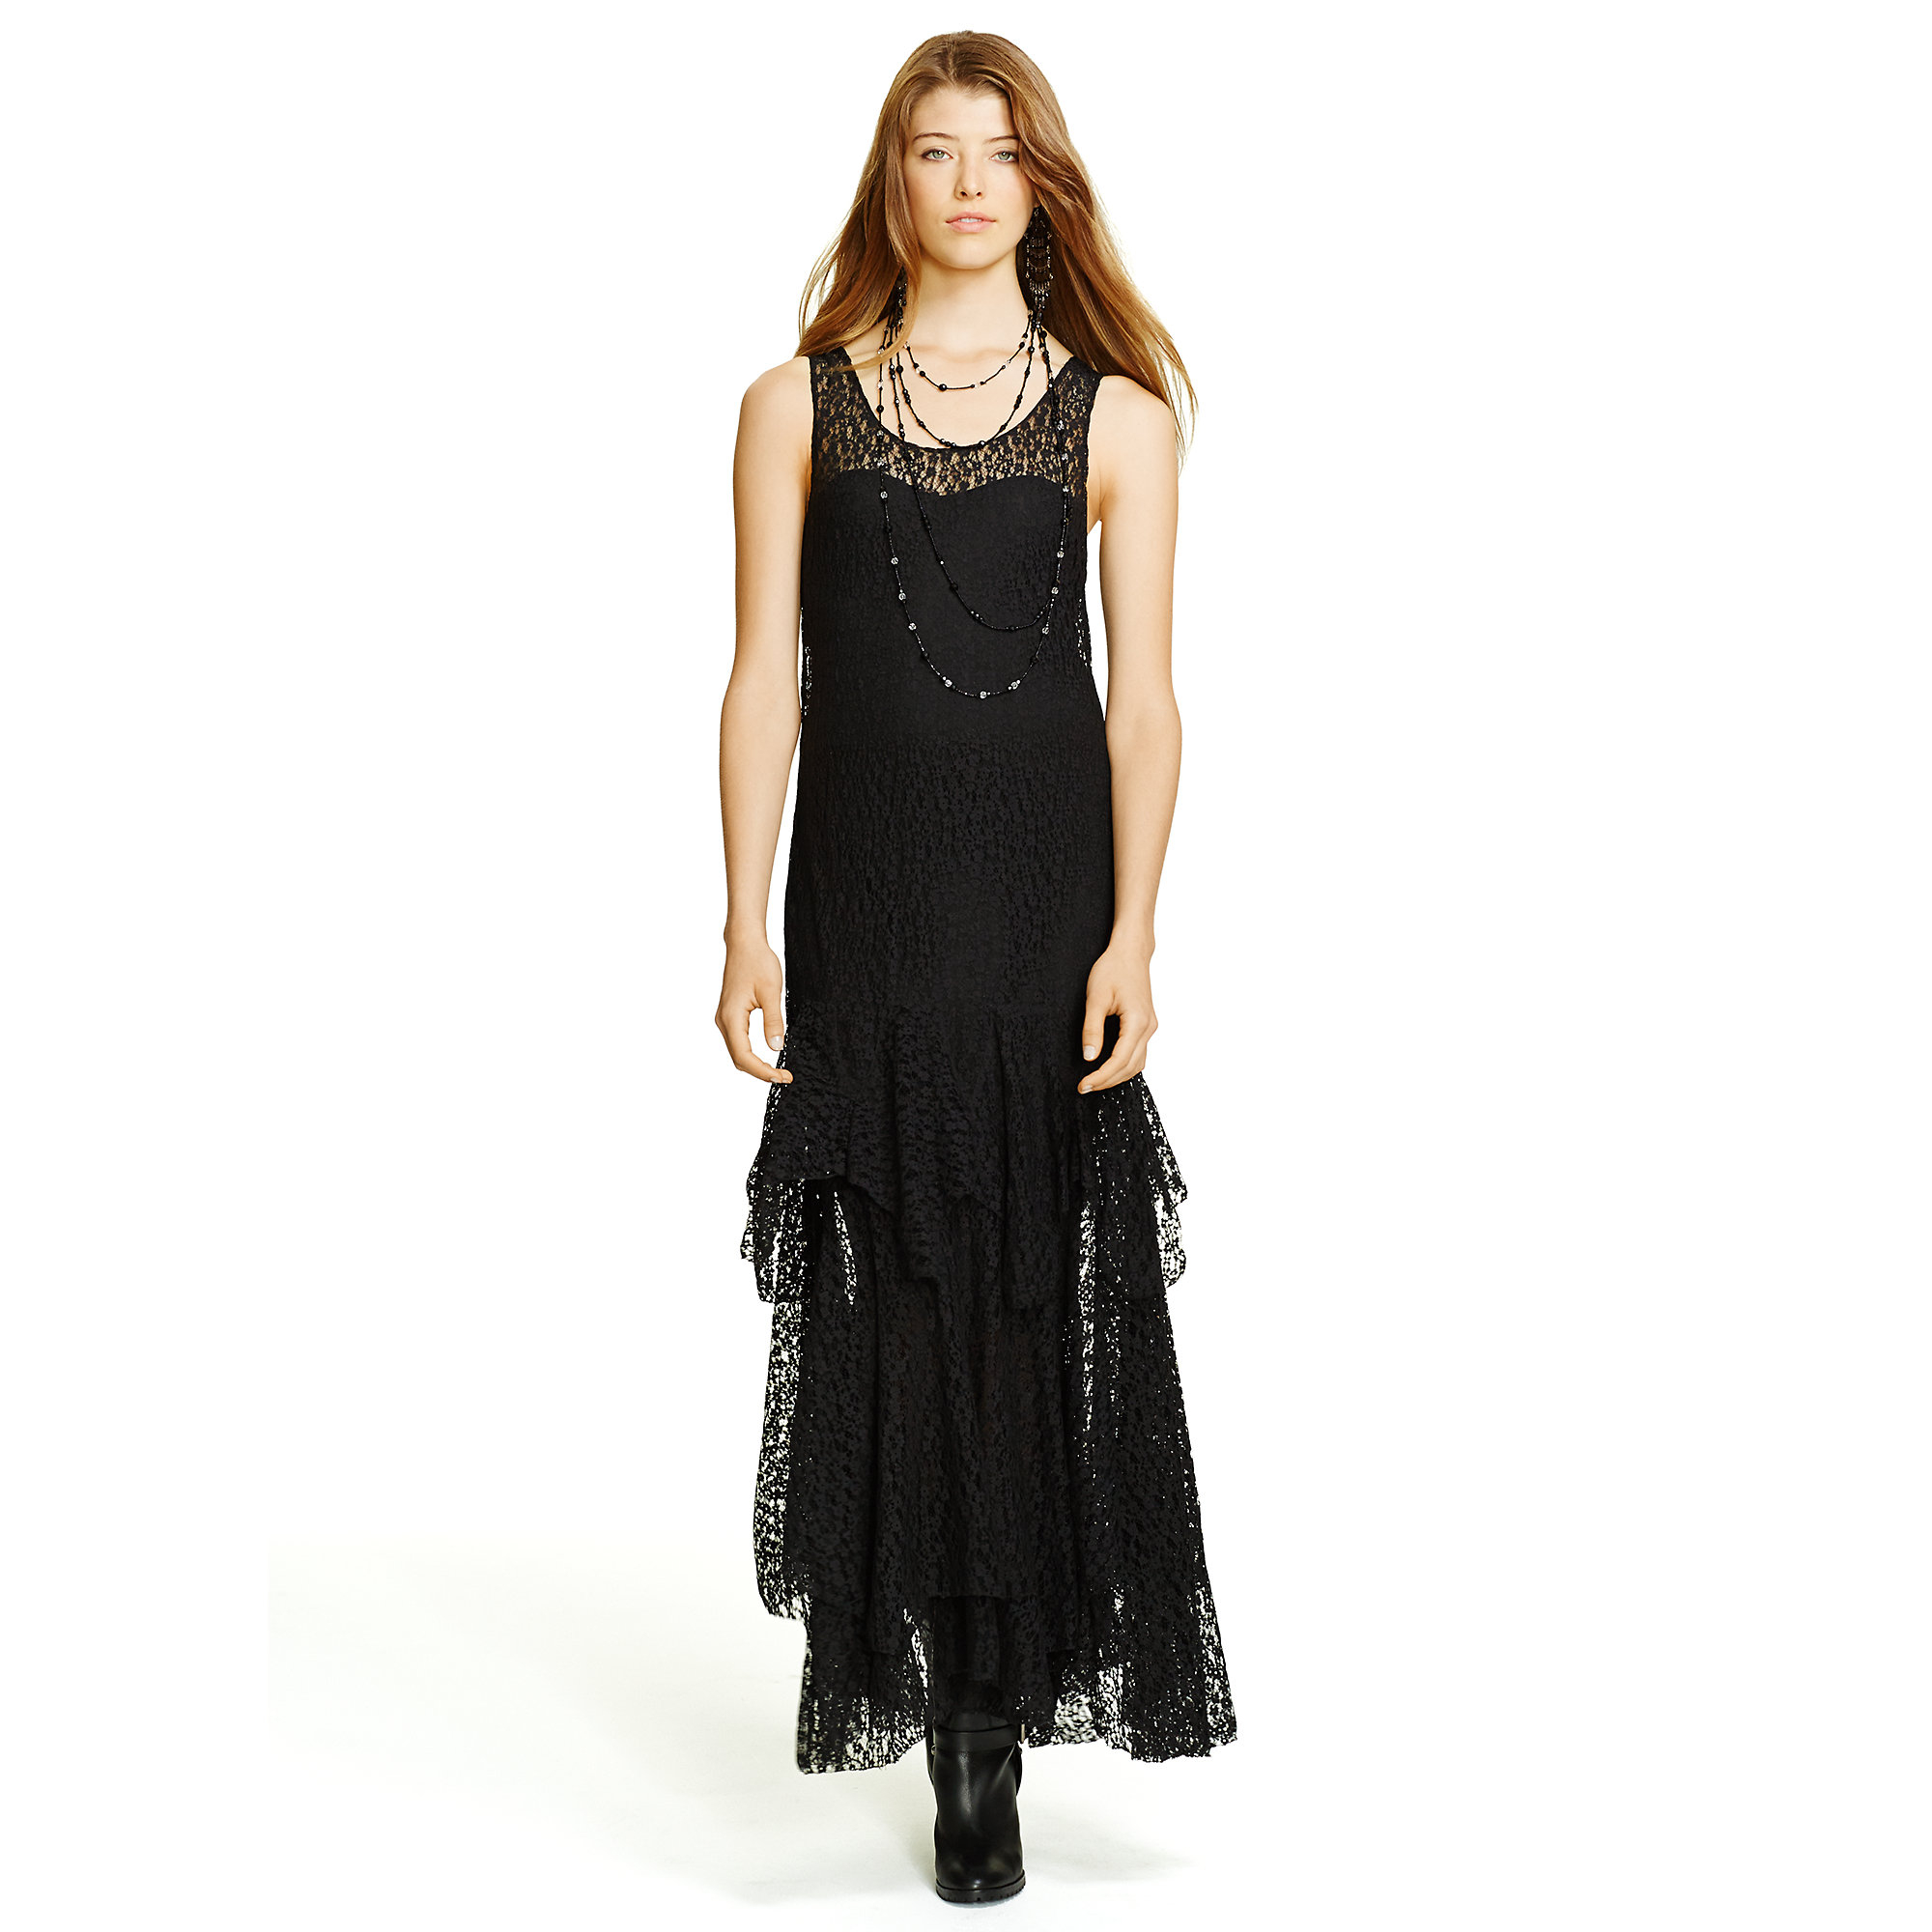 Polo ralph lauren Pointelle-knit Maxidress in Black